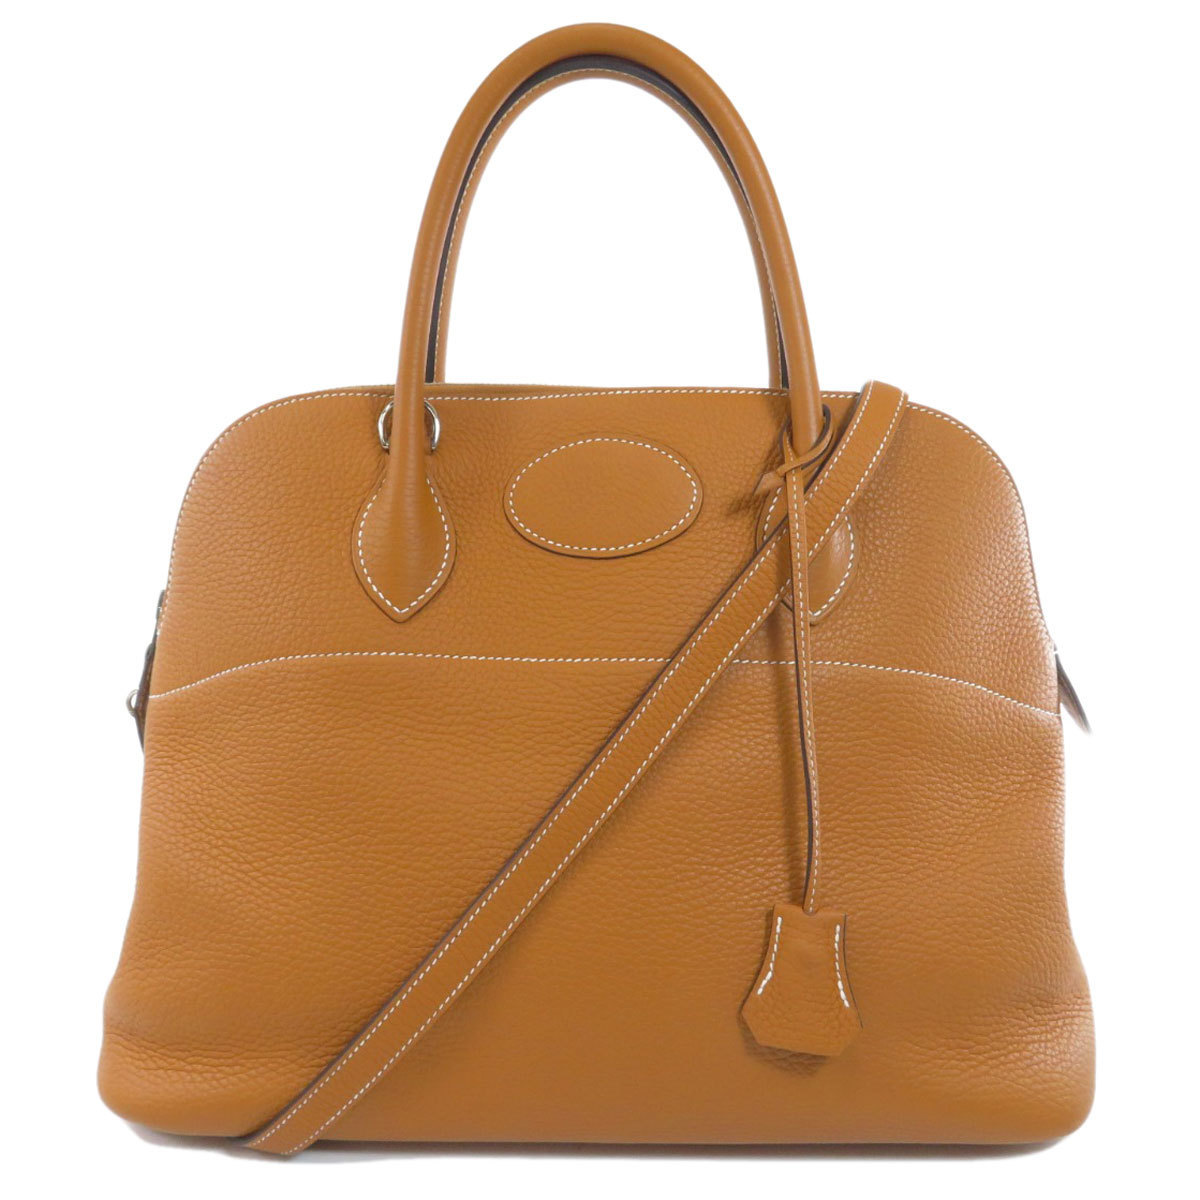 Hermes Bored 35 Taurillon Toffee Handbag Clemence Ladies